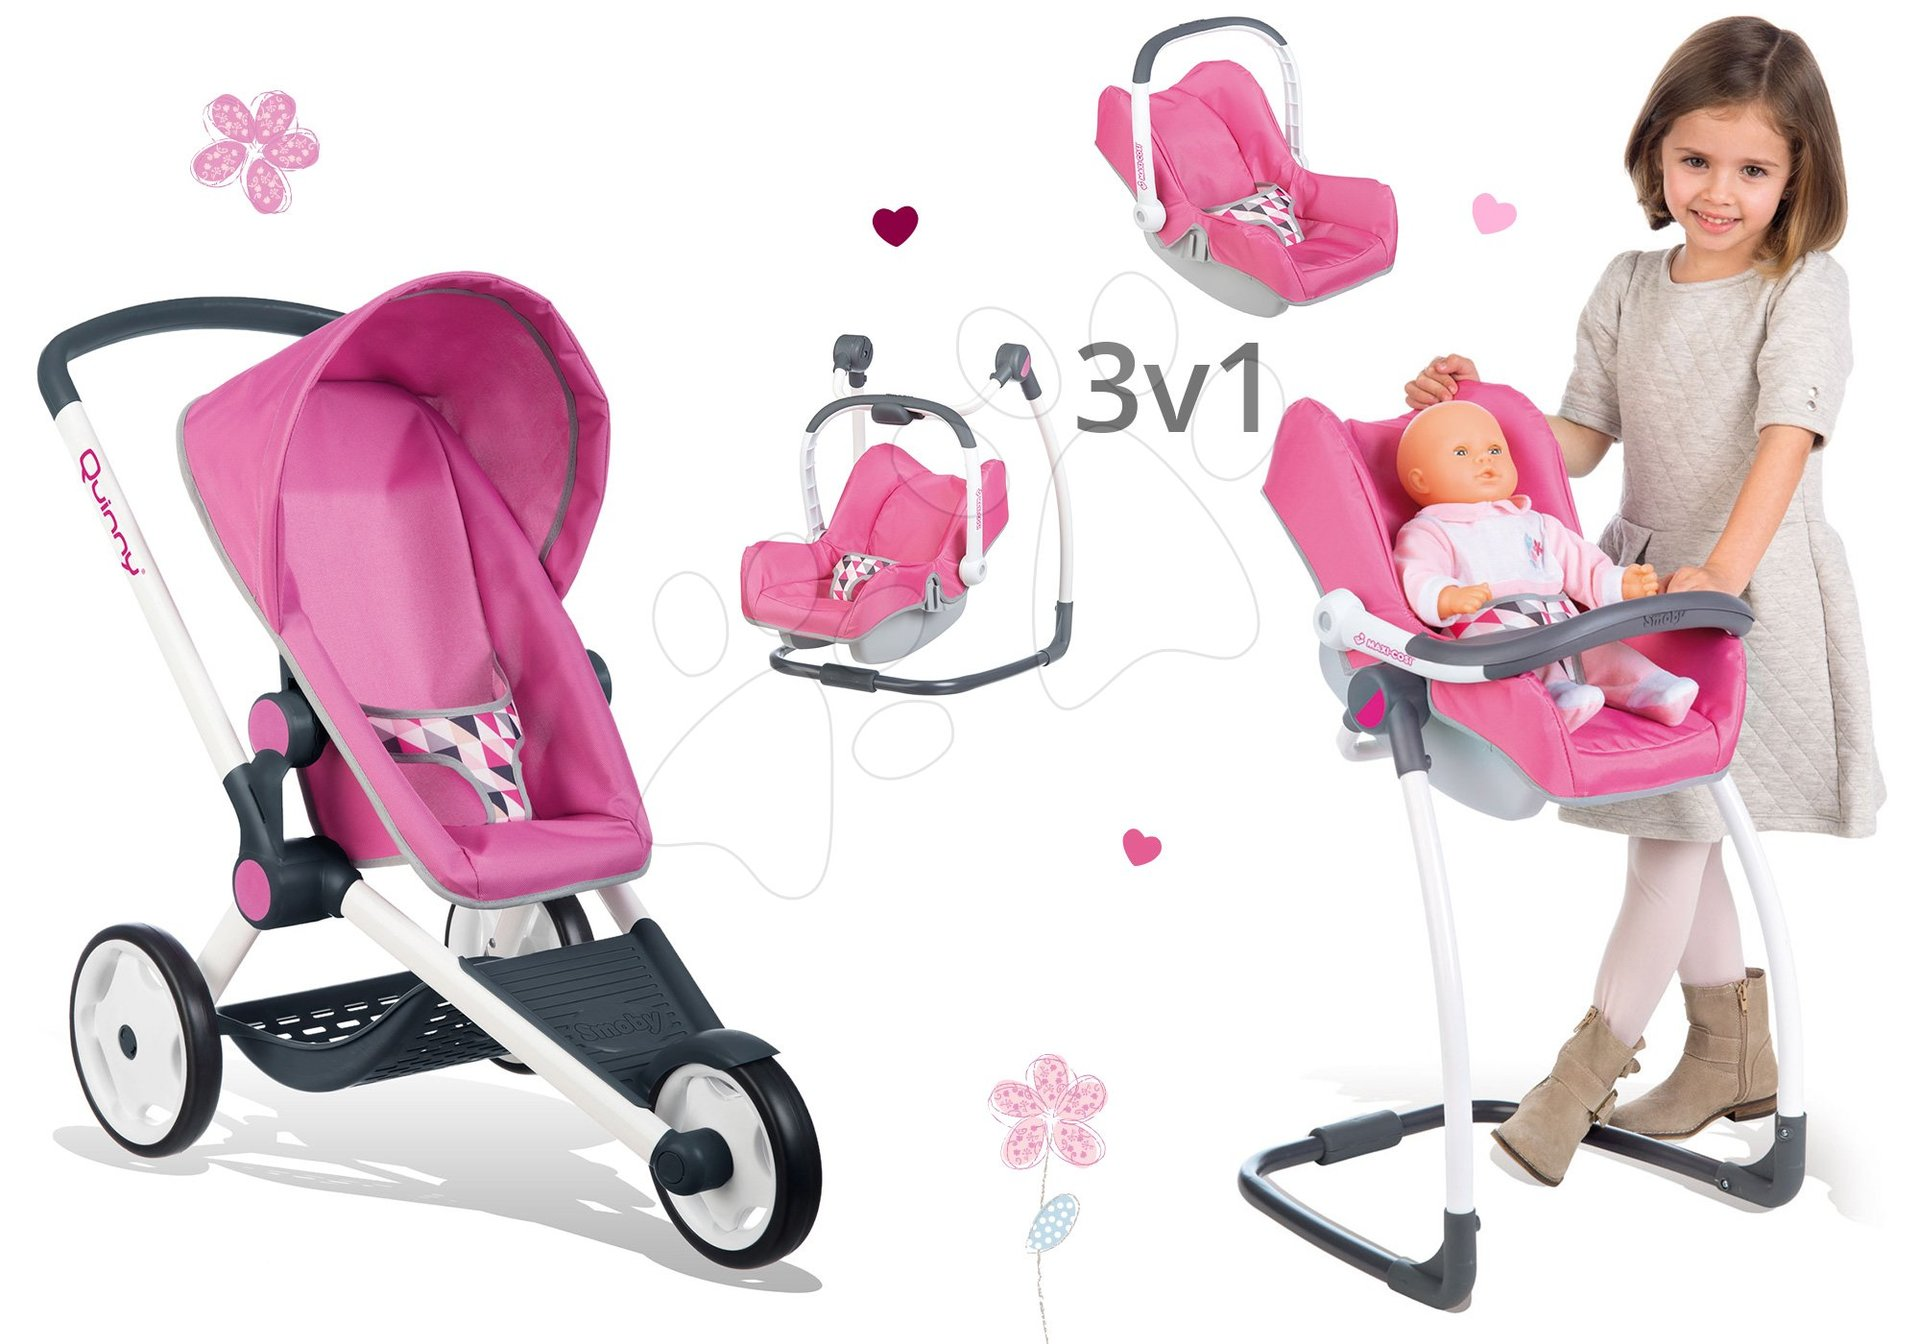 Set kočárek pro panenku Maxi-Cosi&Quinny Smoby a židle, houpačka a autosedačka pro panenku 3v1